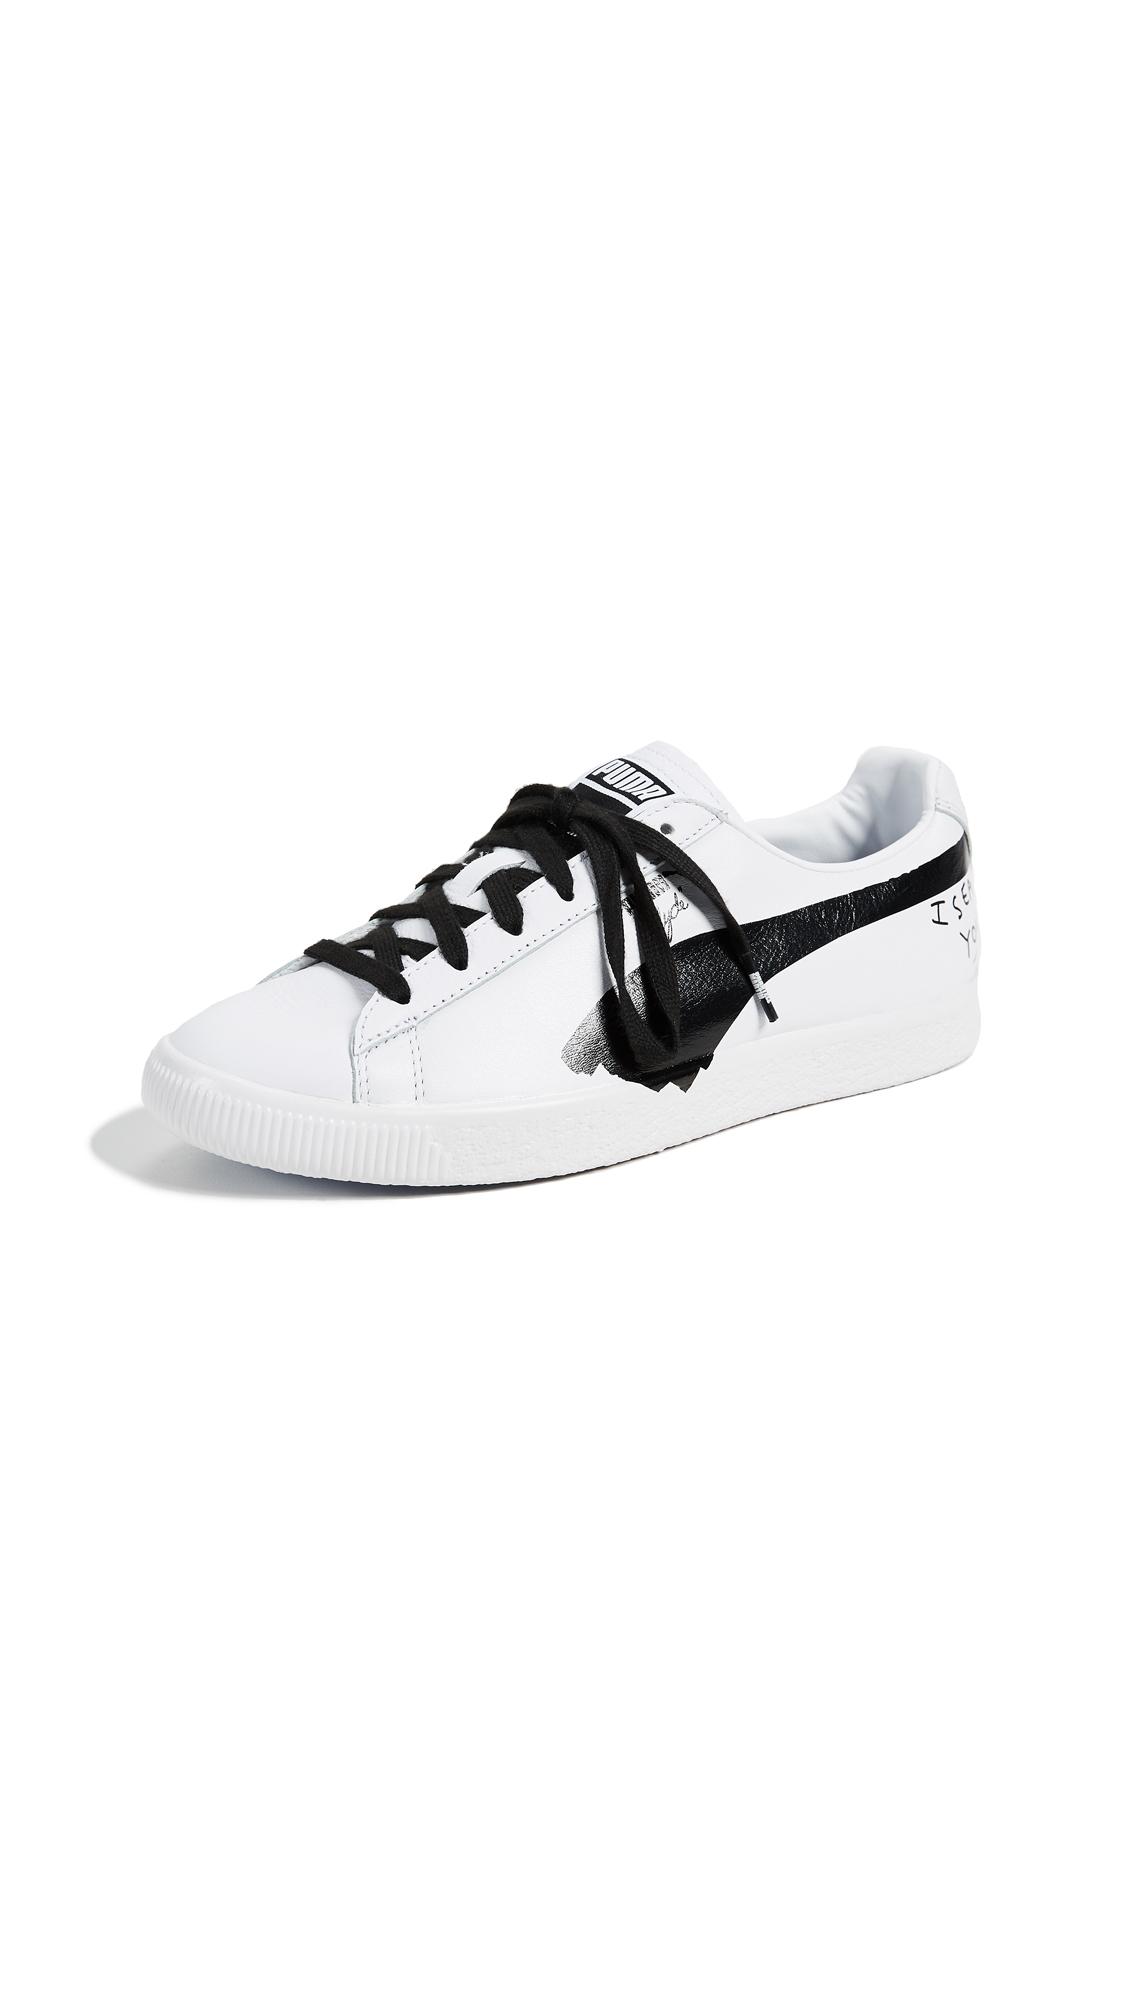 e41822a39981a X Shantell Martin Clyde Sneakers, Puma White/Puma Black